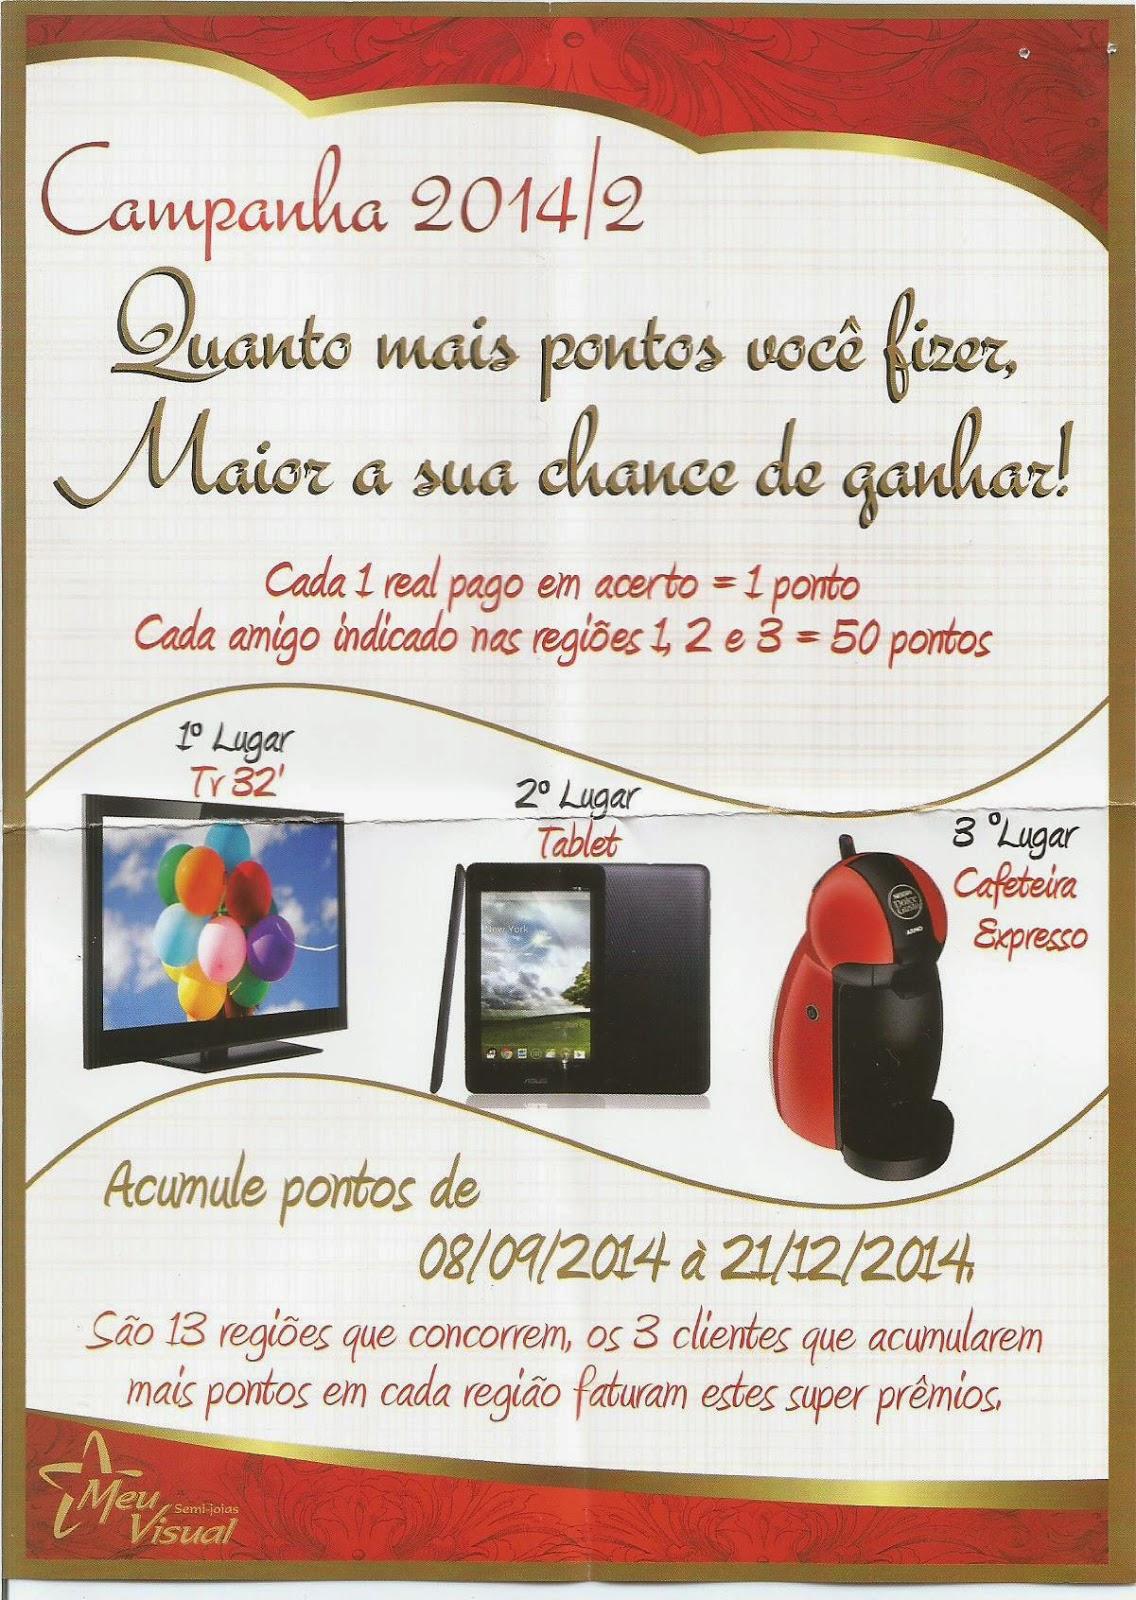 Campanha 2014/02